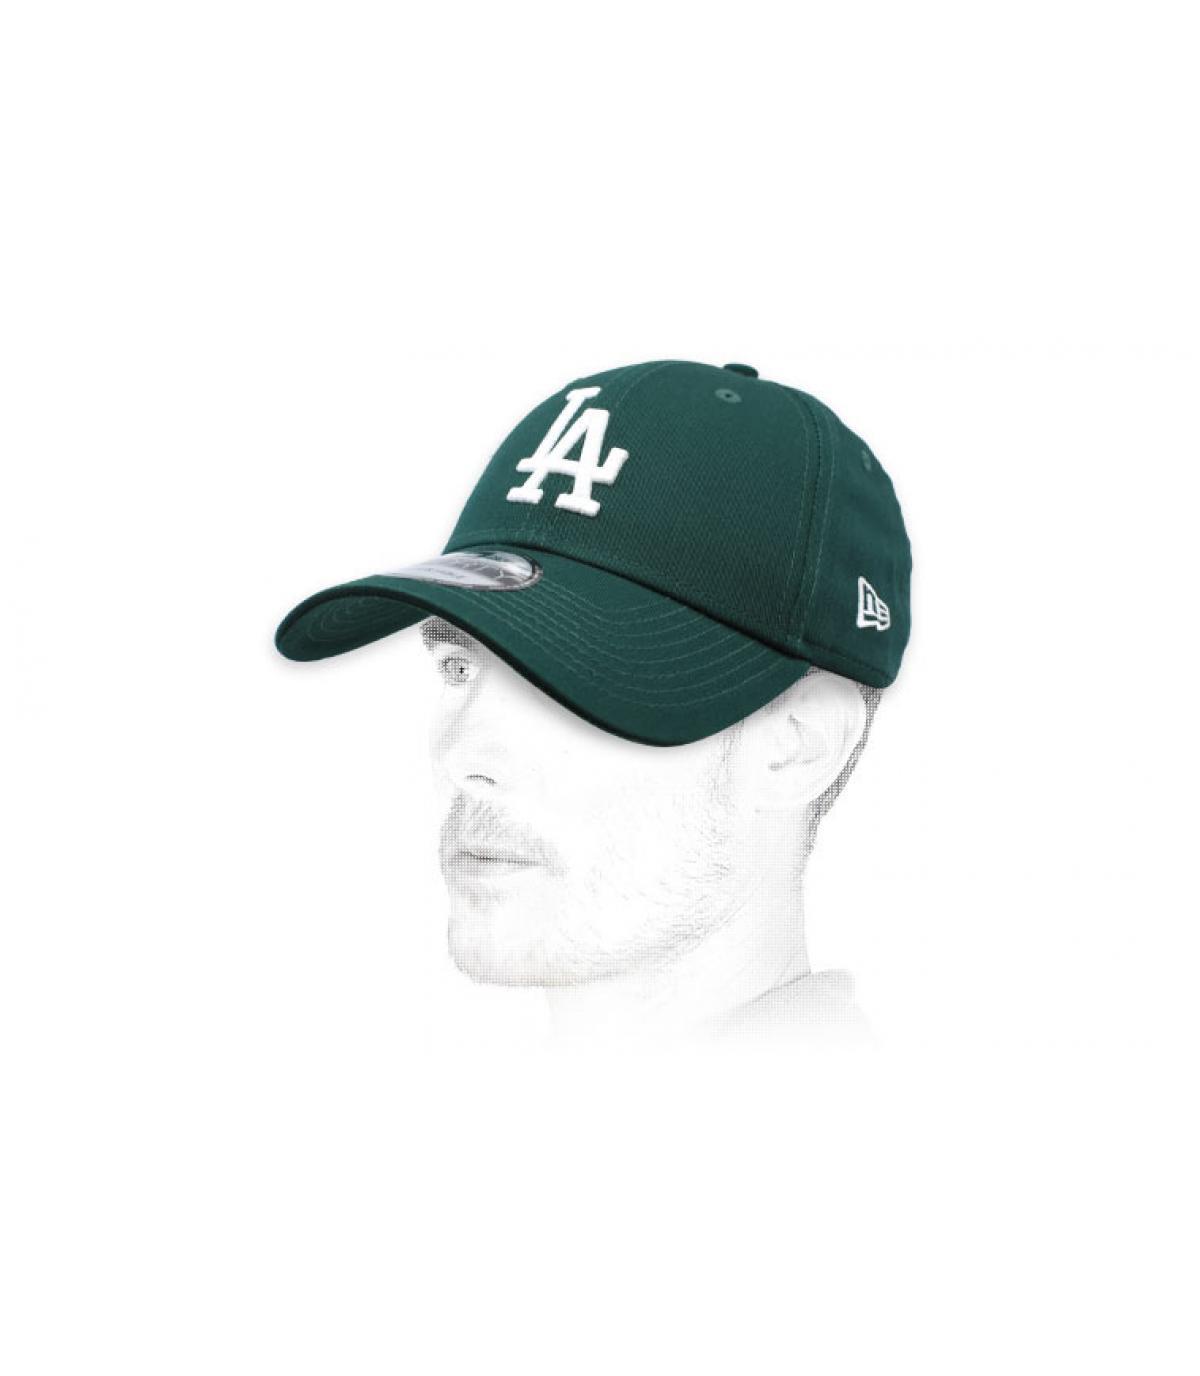 casquette LA vert